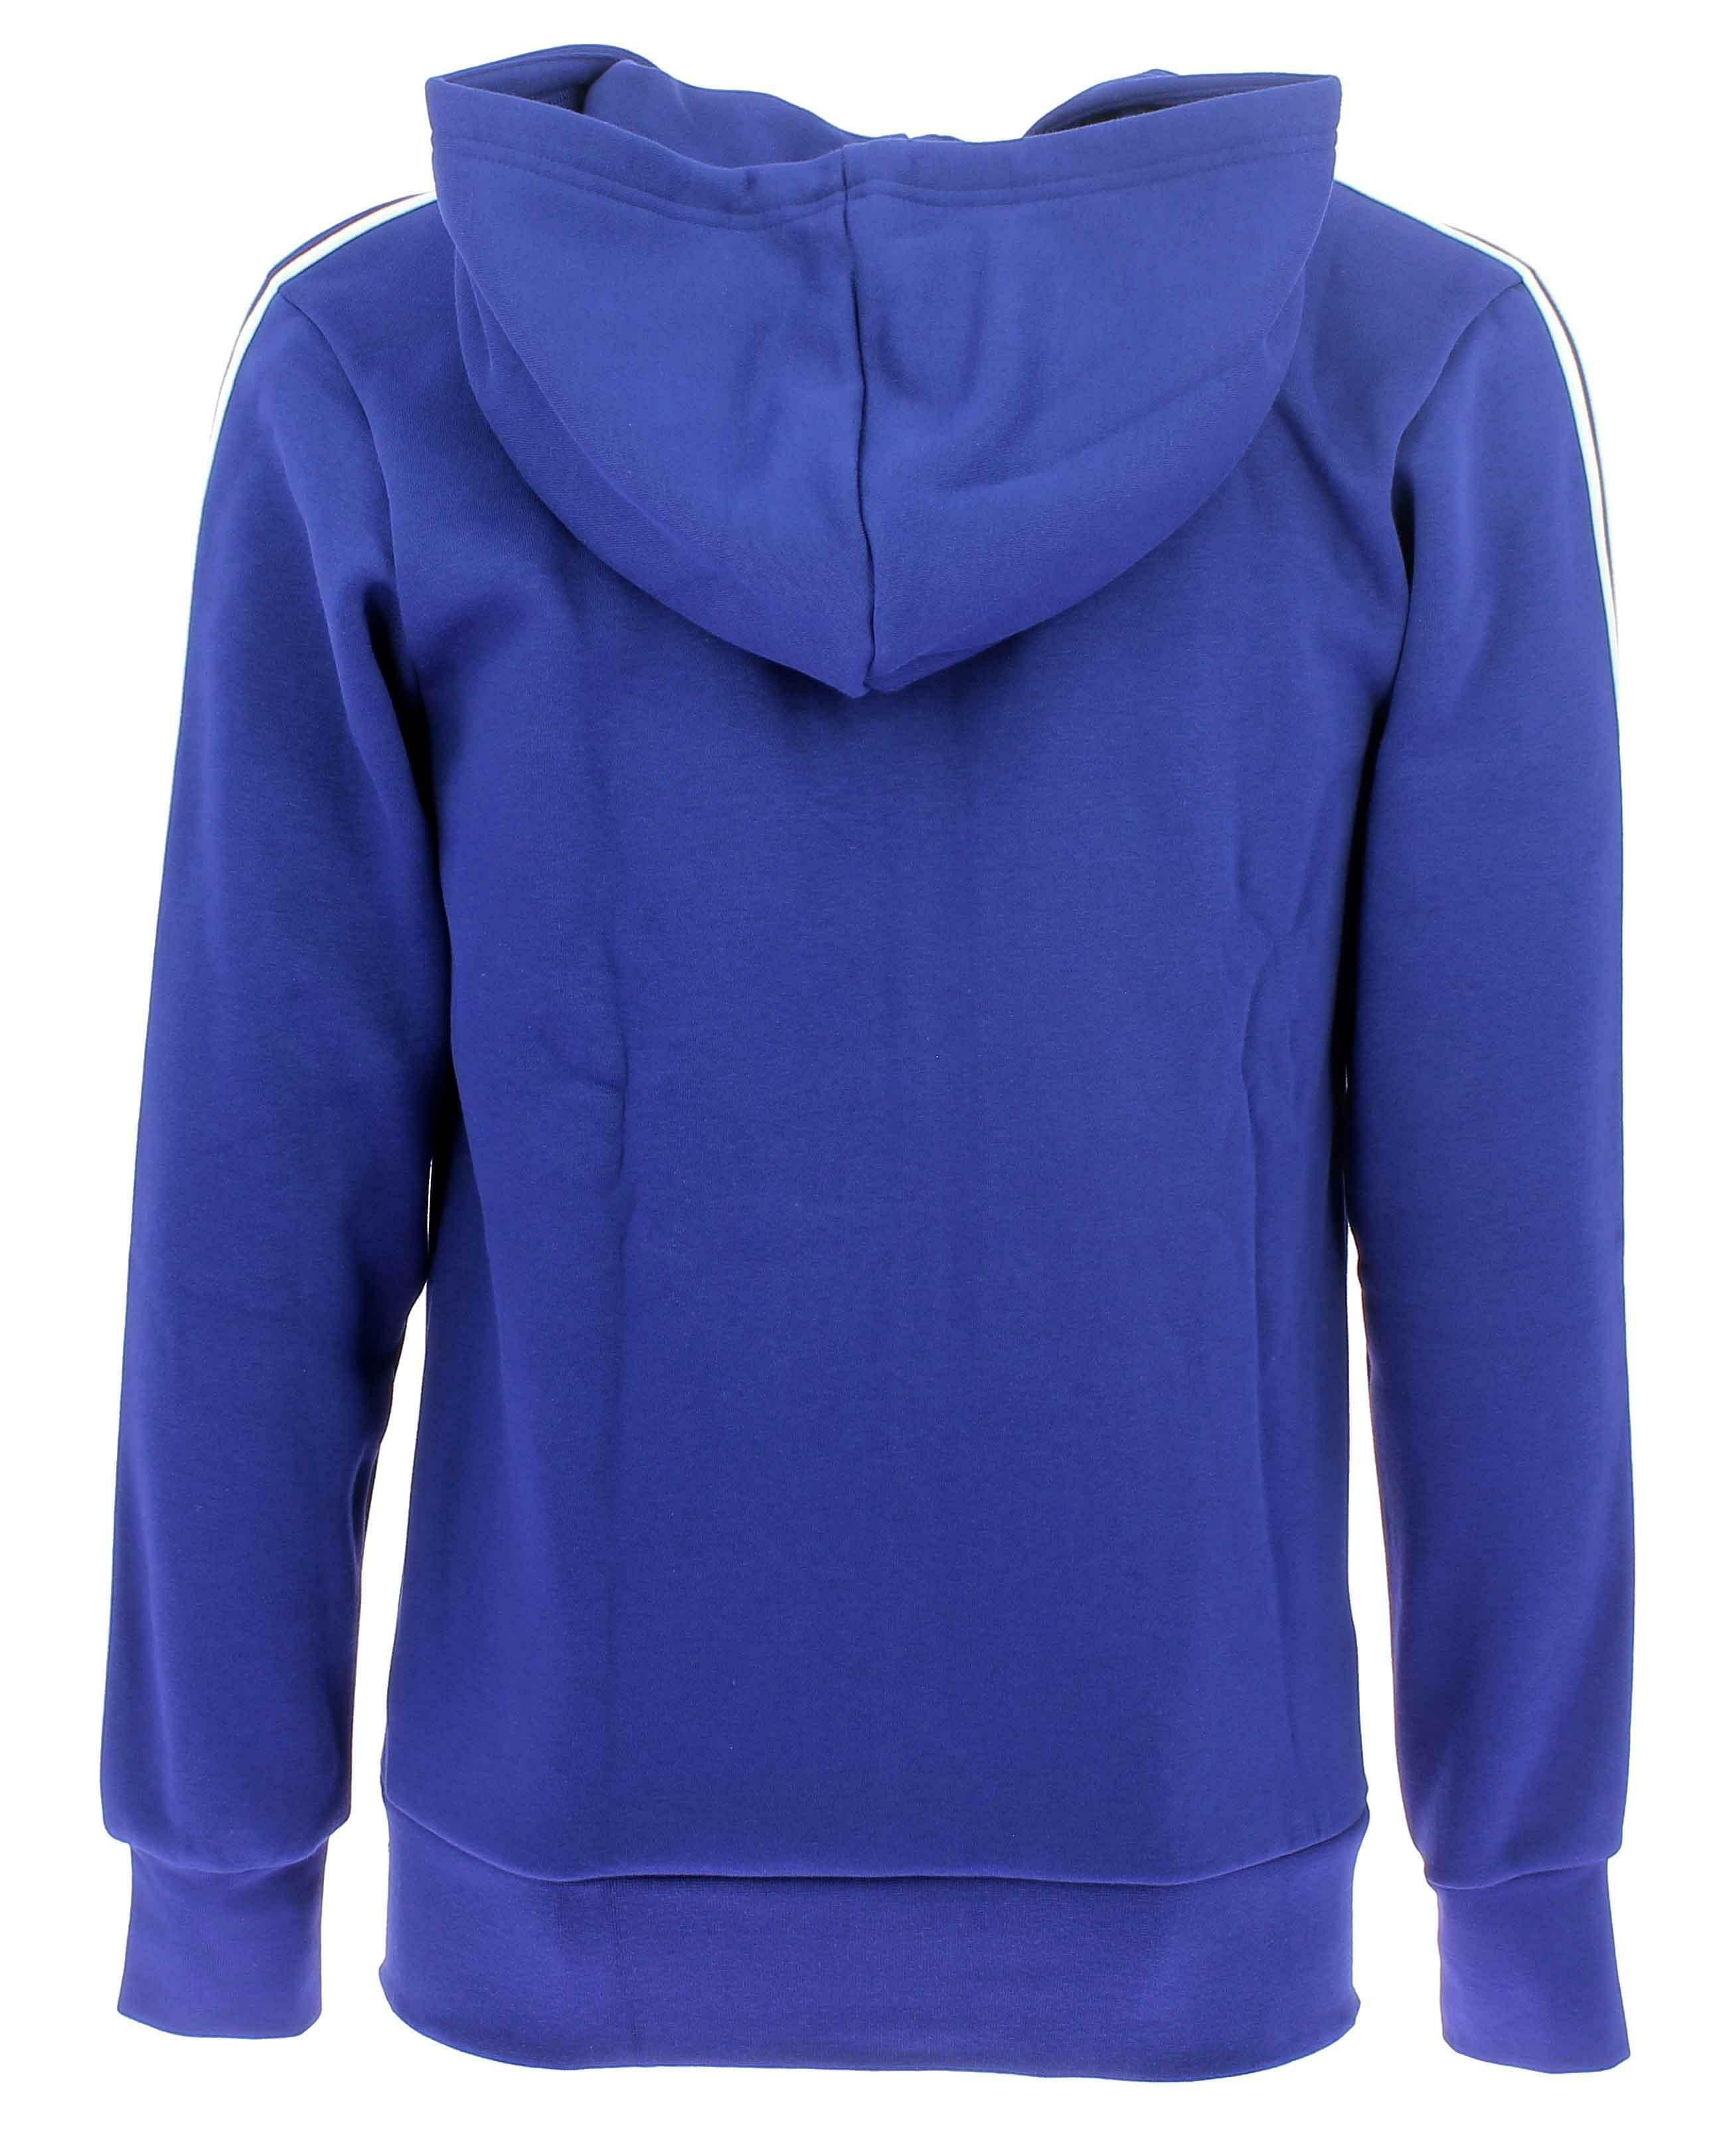 adidas adidas ess 3s fz b giacchetto uomo blu felpato cz7358